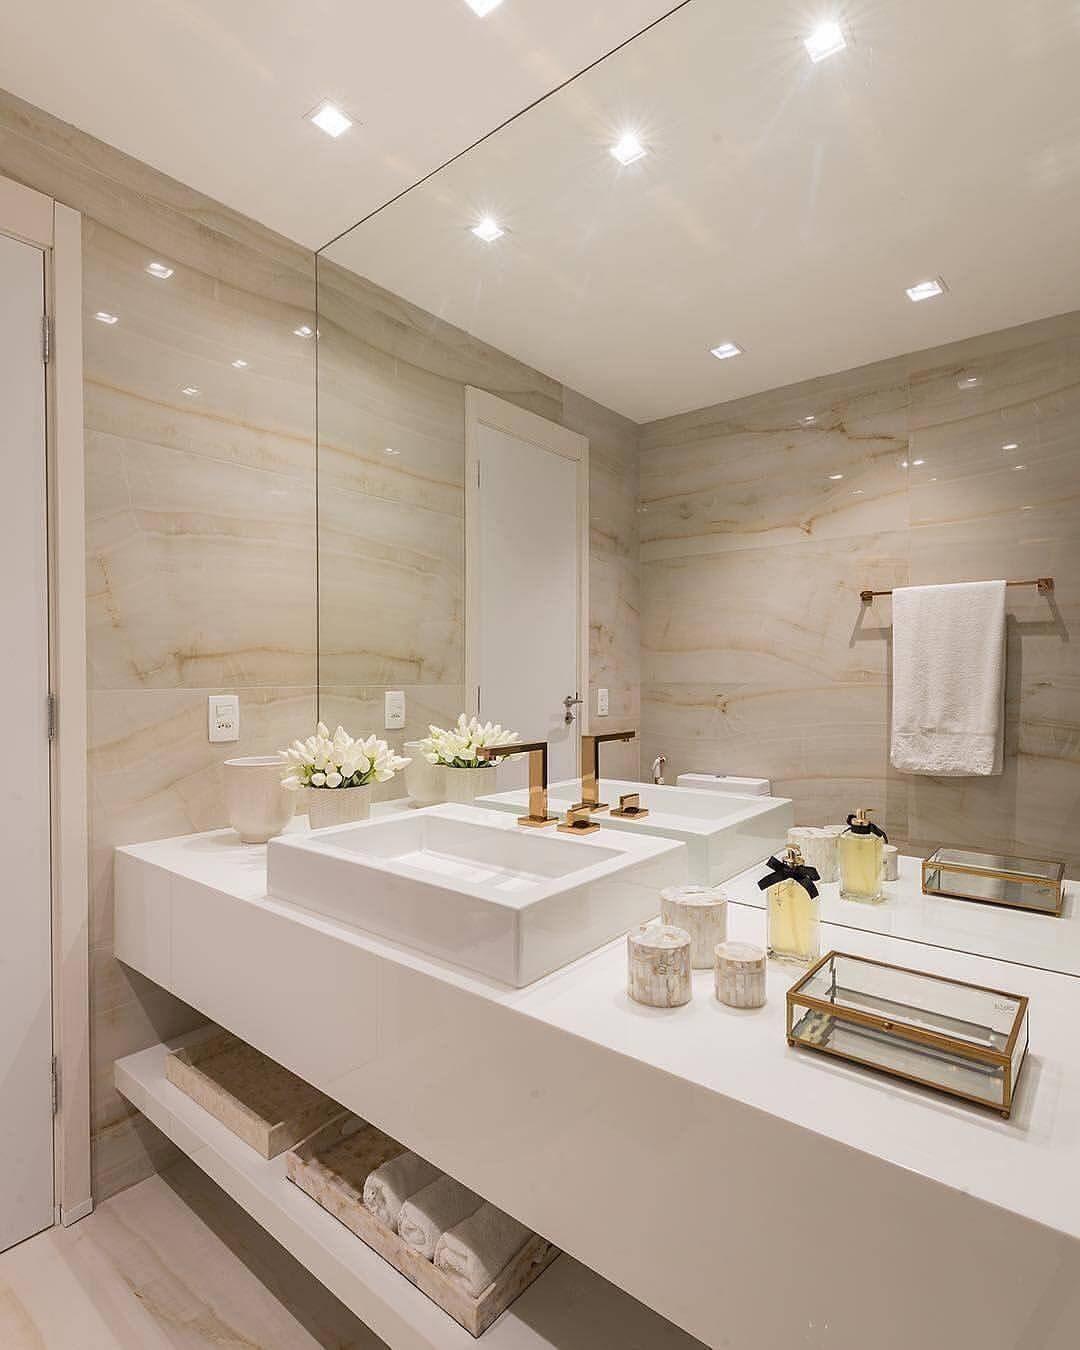 Porcelanato para banheiro marmorizado e bancada branca chique